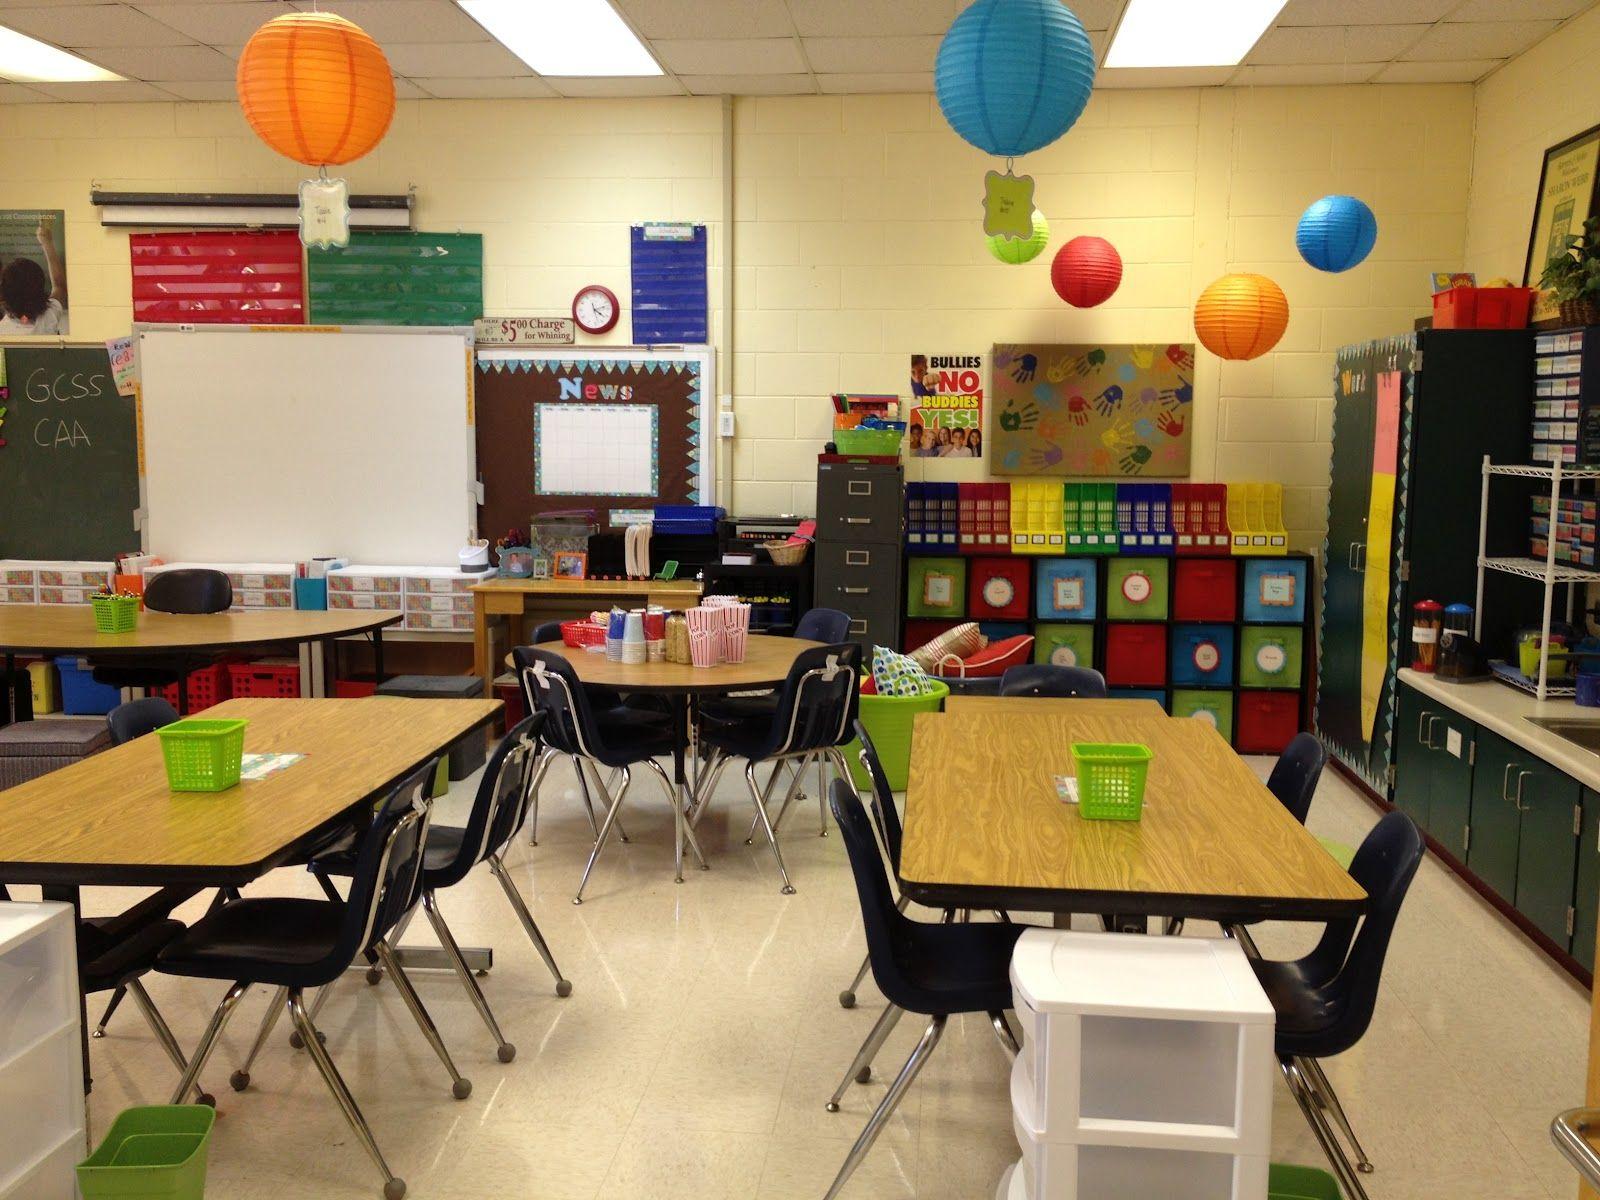 5th grade classroom blog (Nerdy, Nerdy, Nerdy) << OMG I freaking LOVE her classroom!